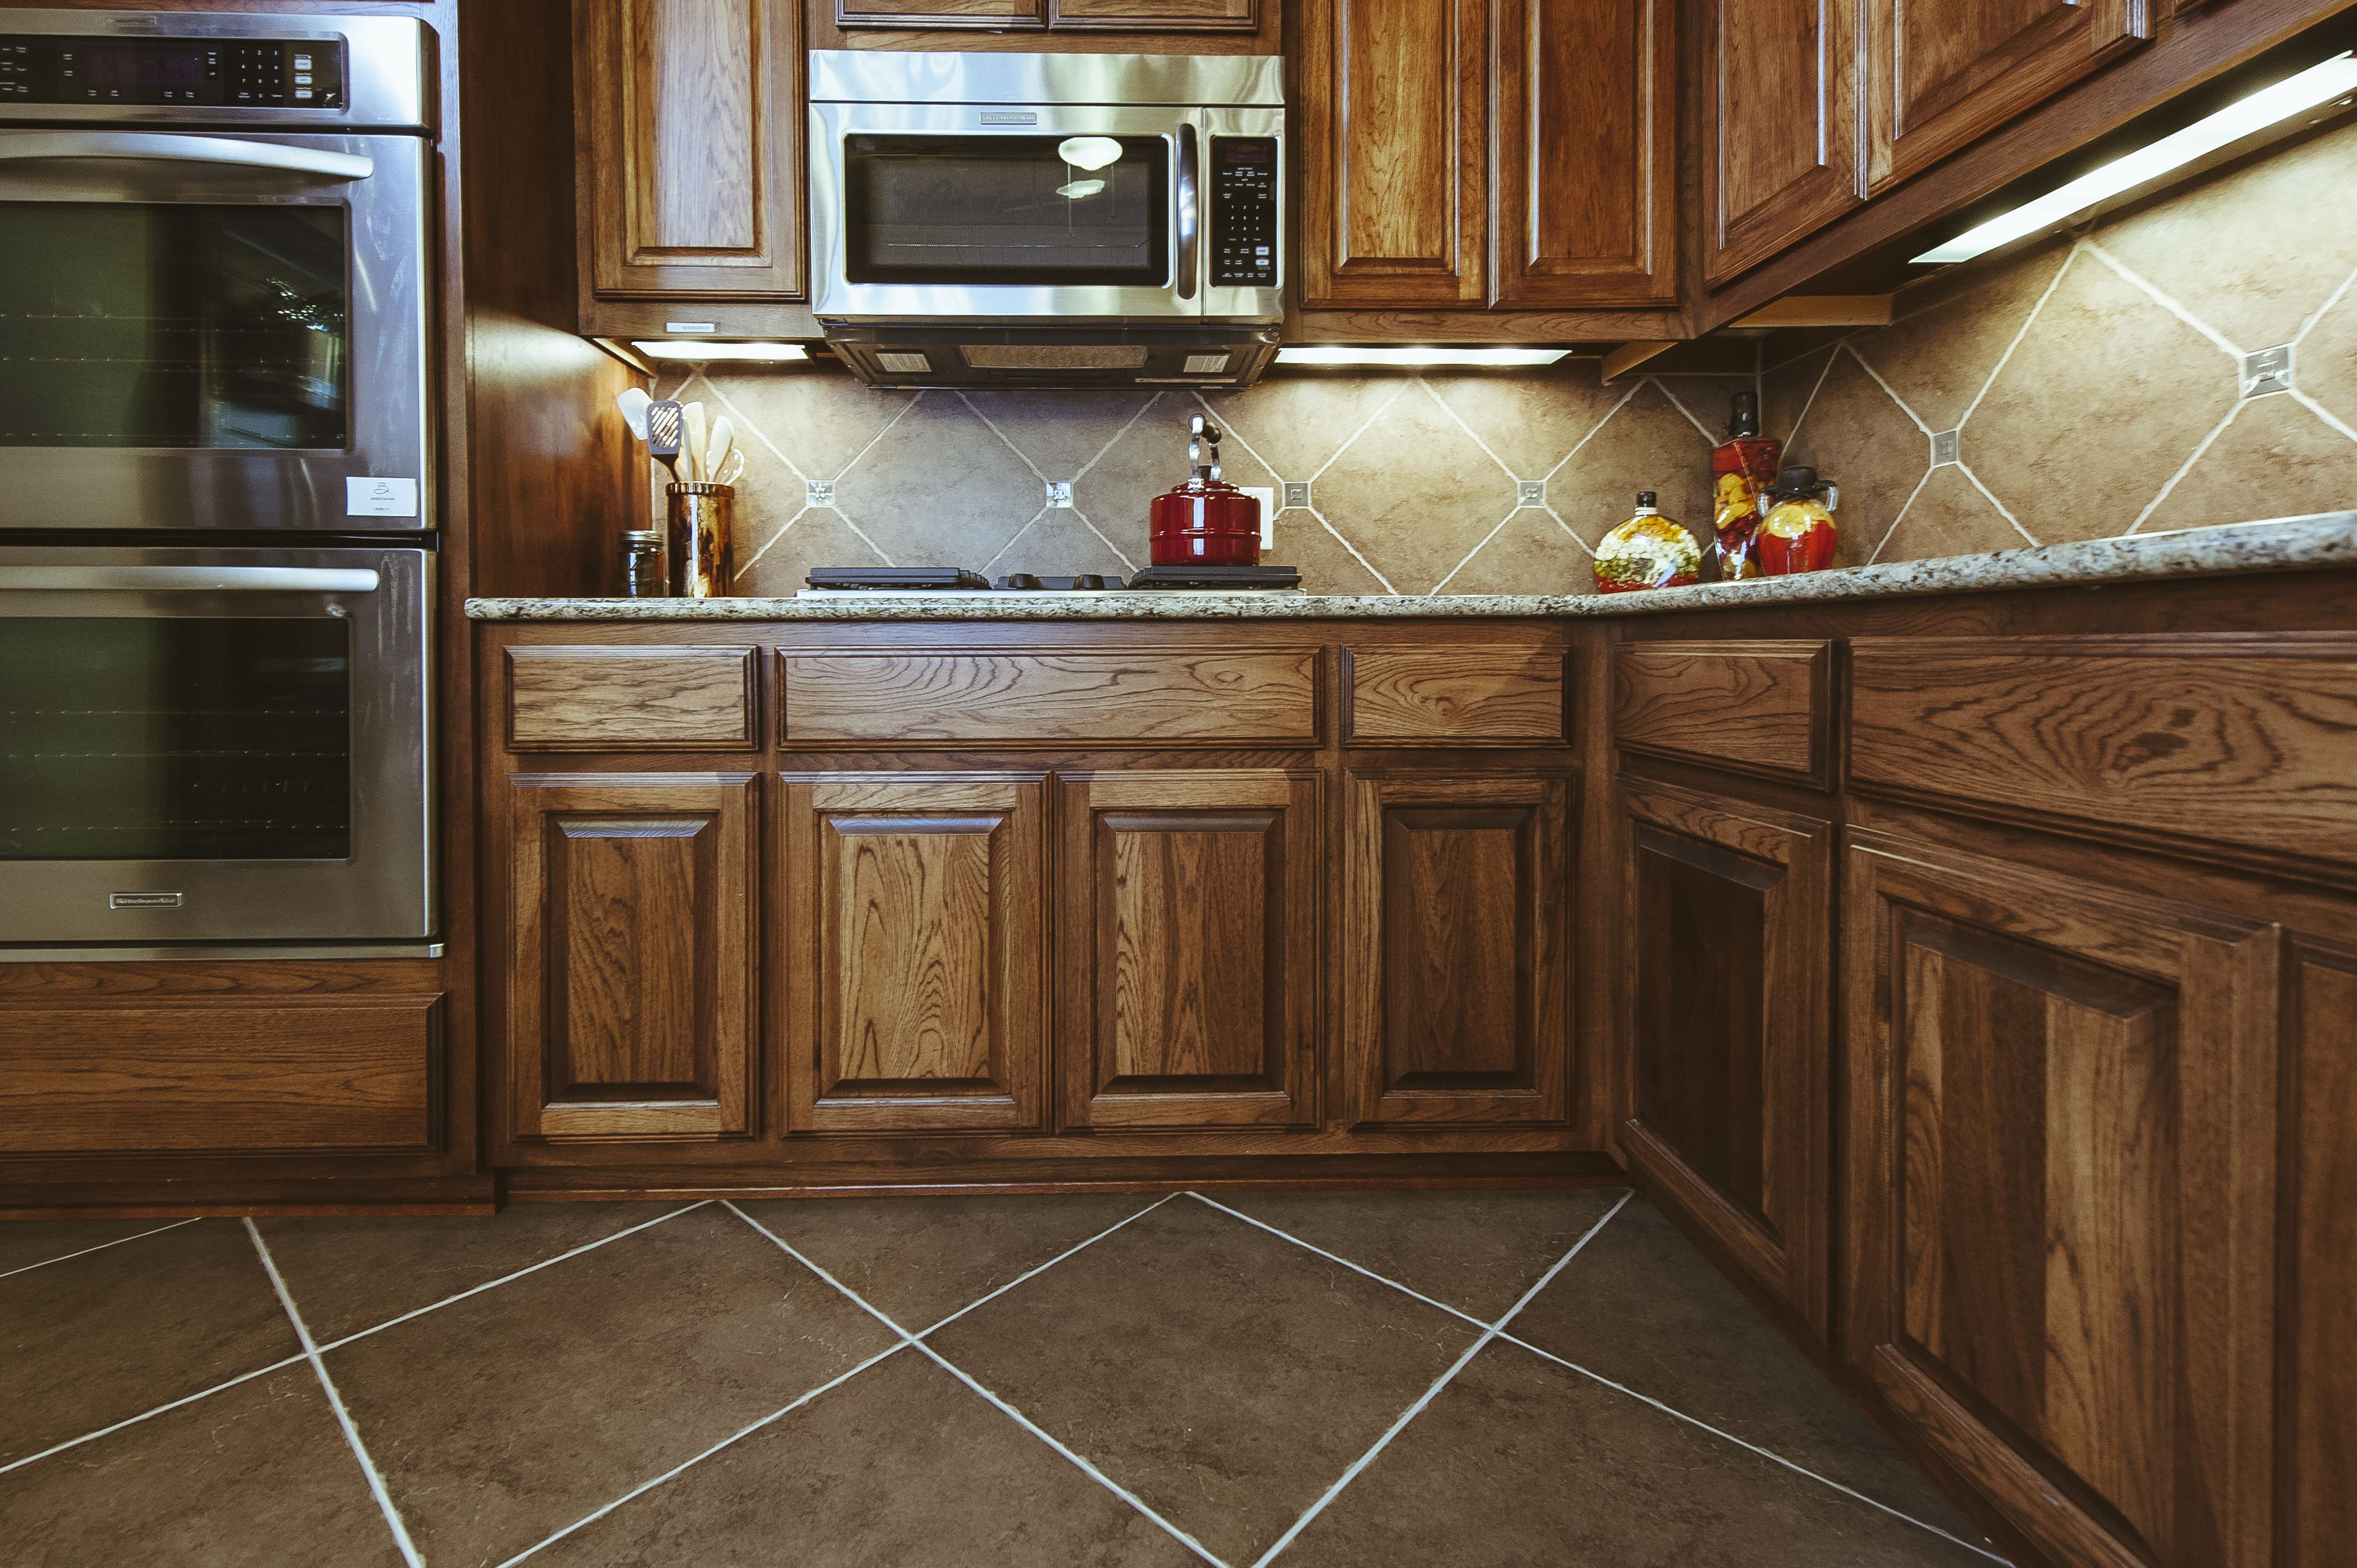 kitchen flooring ideas to match oak cabinets  oakkitchen